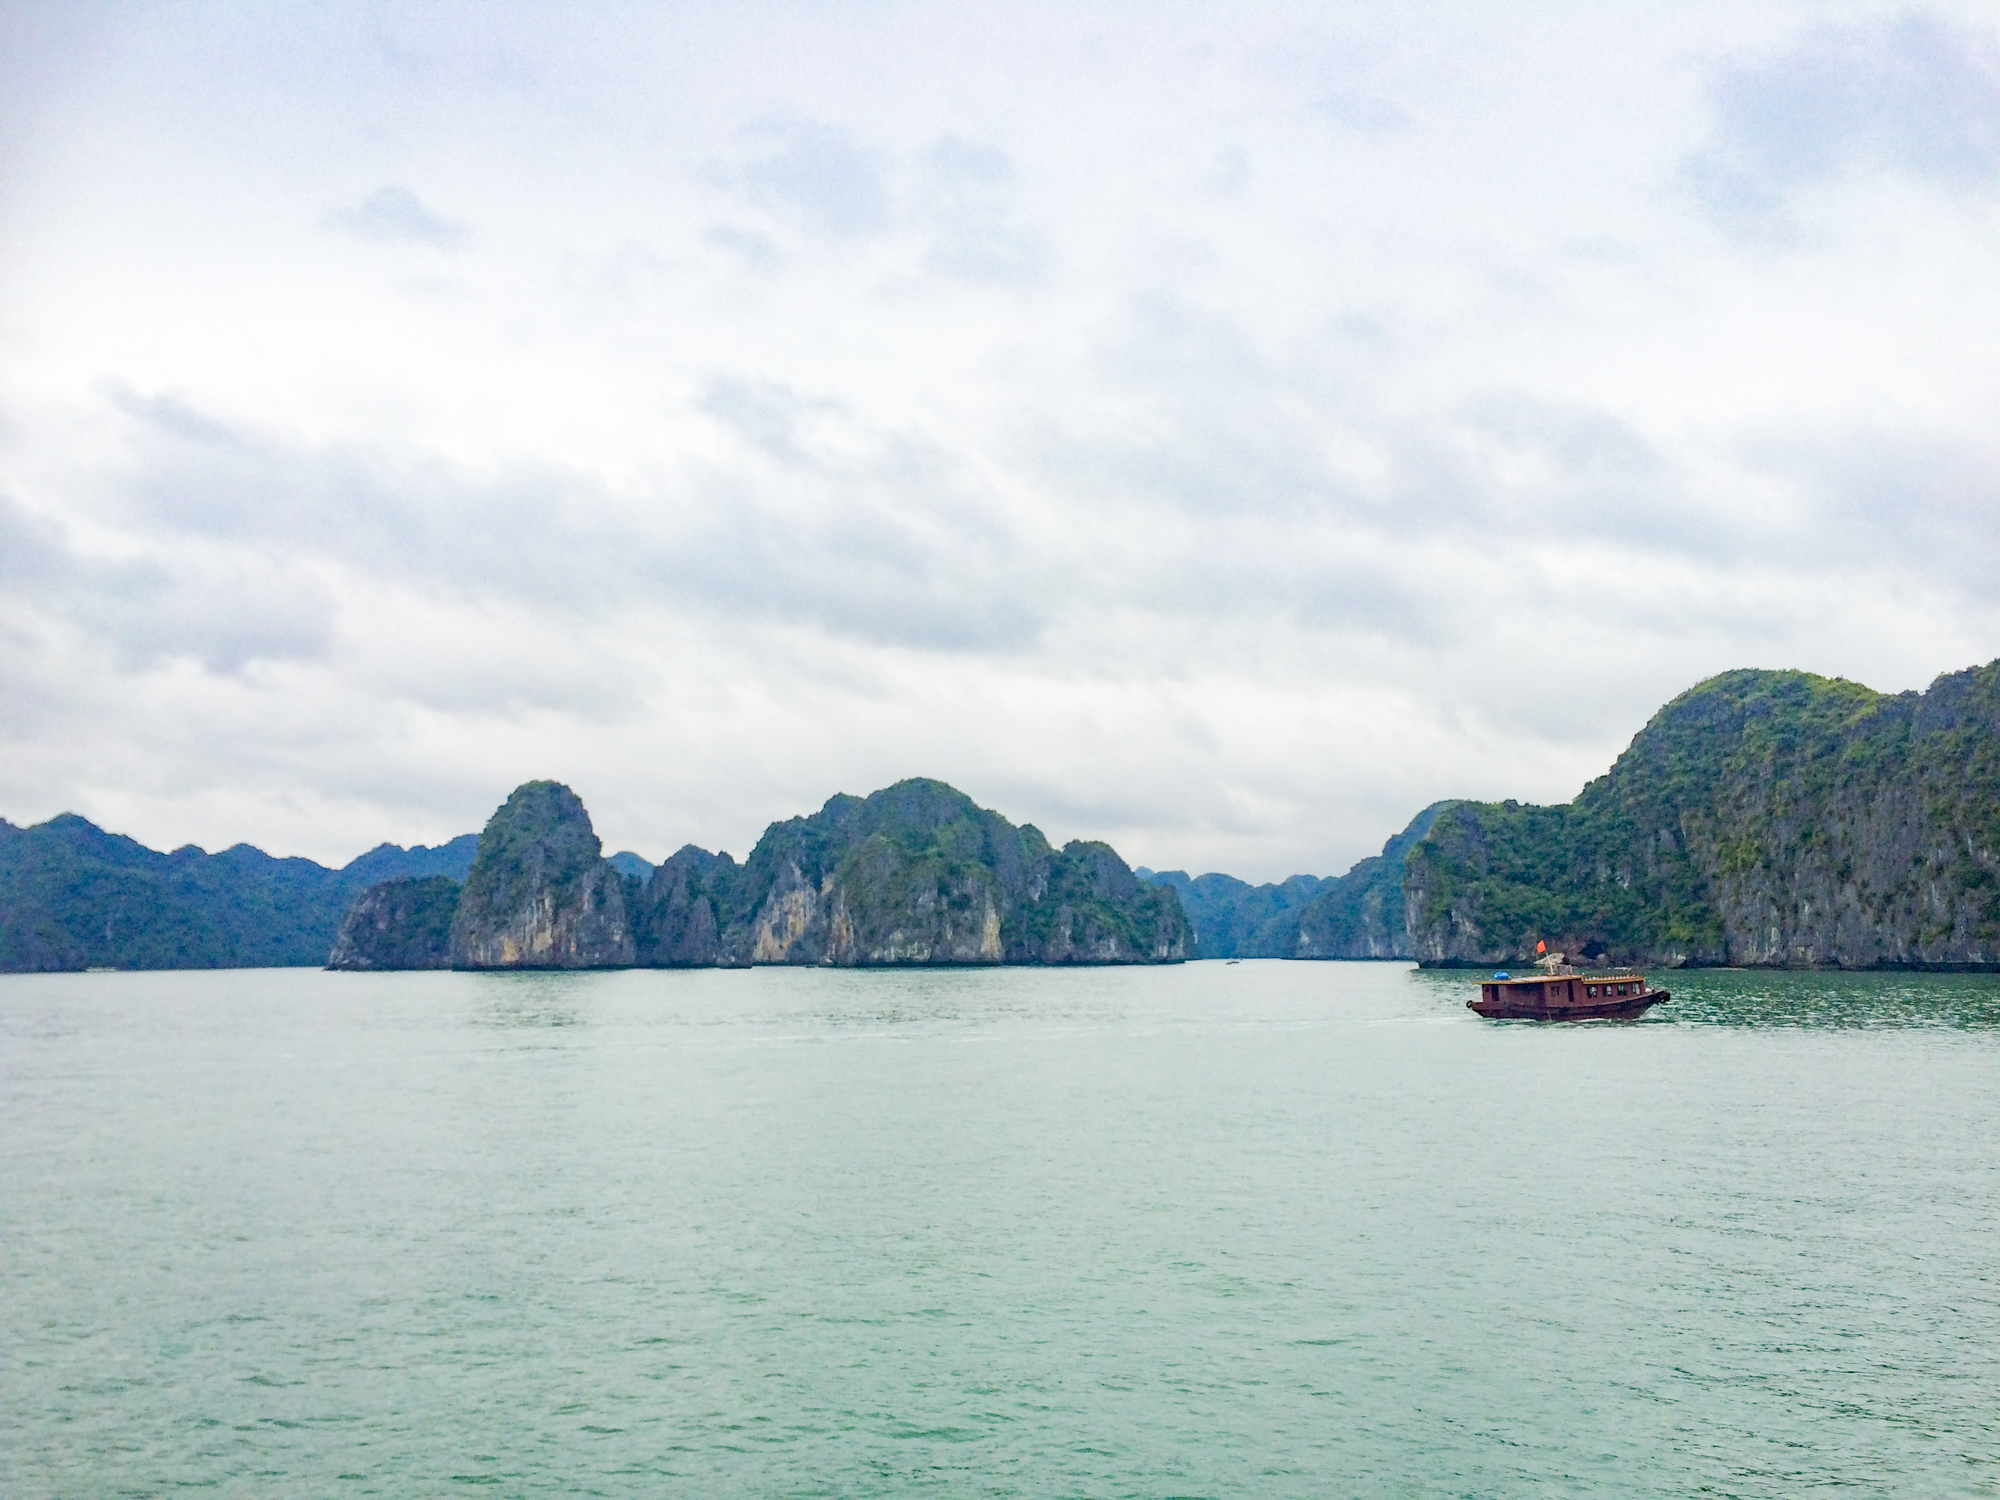 - Fox Mask -Elaine Villatoro - Live More, Travel More - Vietnam - Vietnã - Halong Bay - Castaway Islands - Vietnam Backpackers - Hanoi Backpackers - Beach - Praia